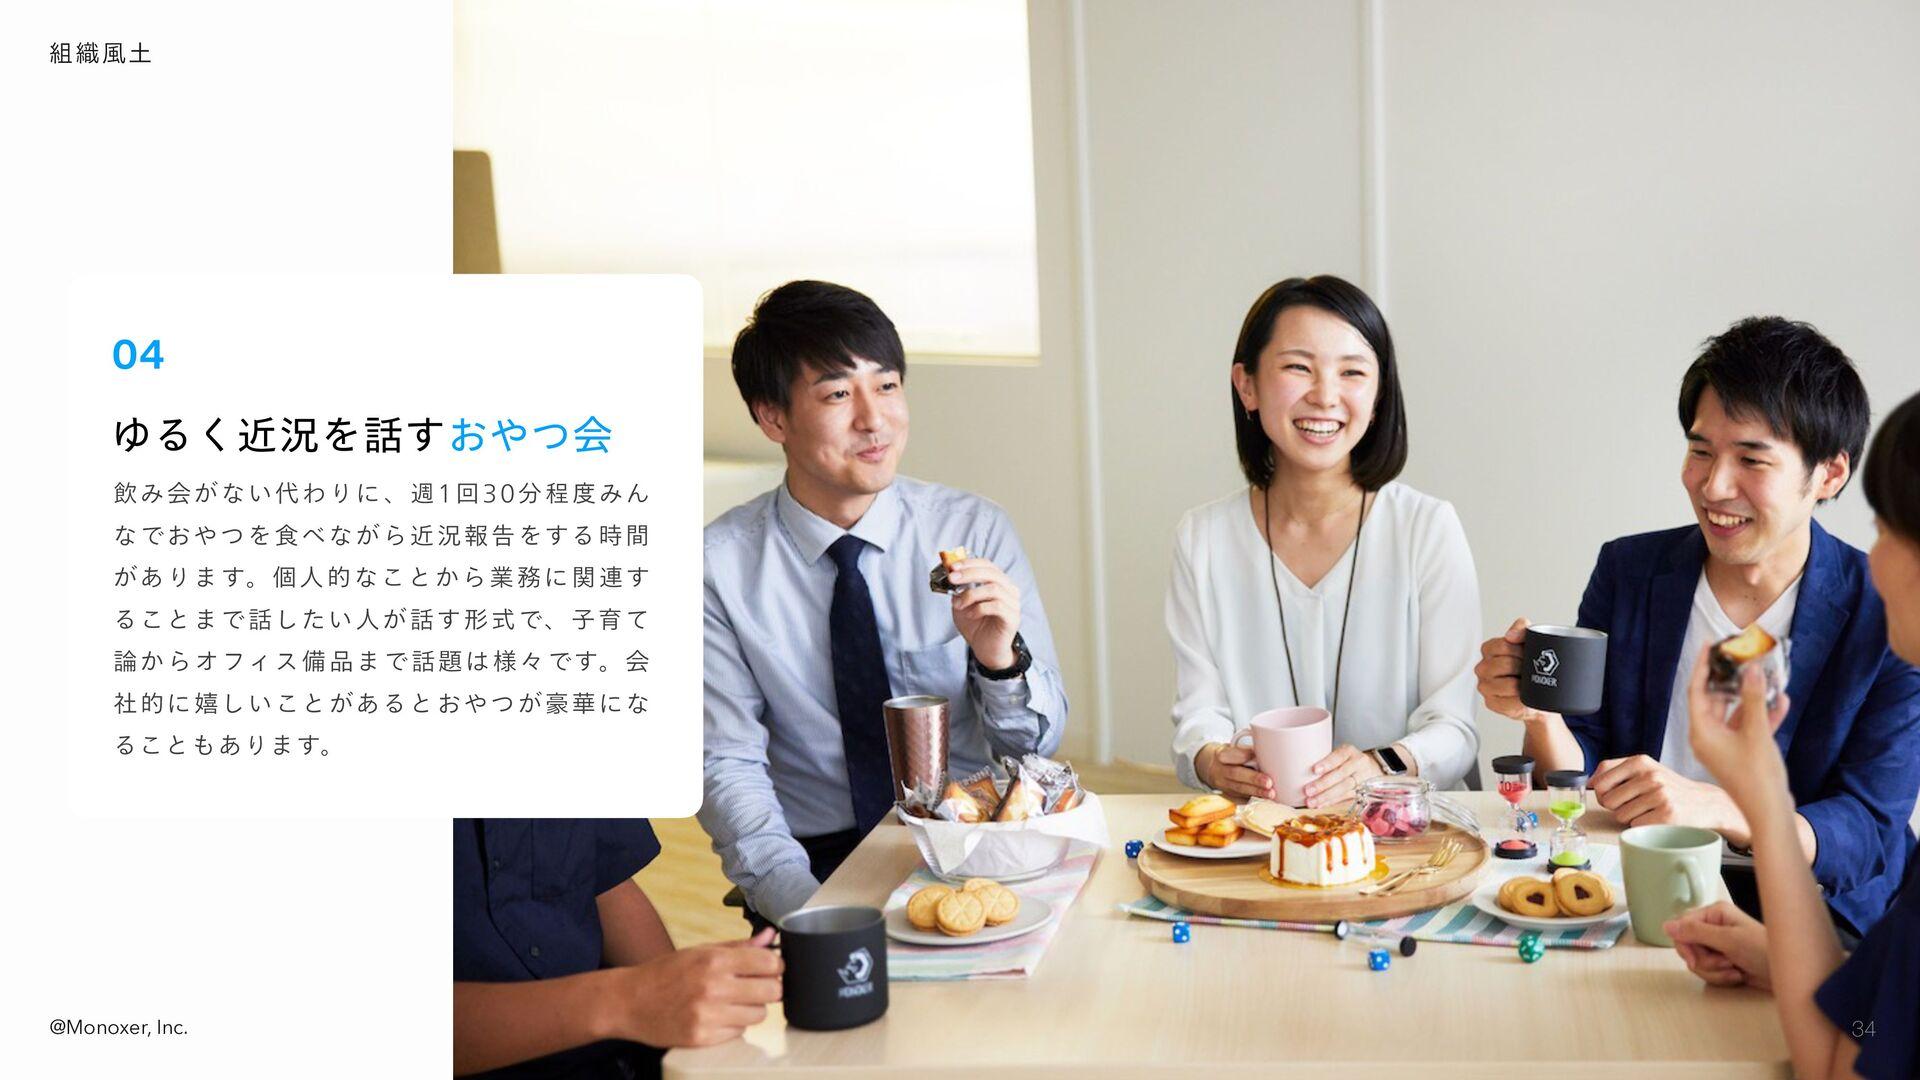 34 @Monoxer, Inc. Ϙʔυϝϯόʔ ଠ࿕  $&0 ൞༄ܓ༎ $50 ...